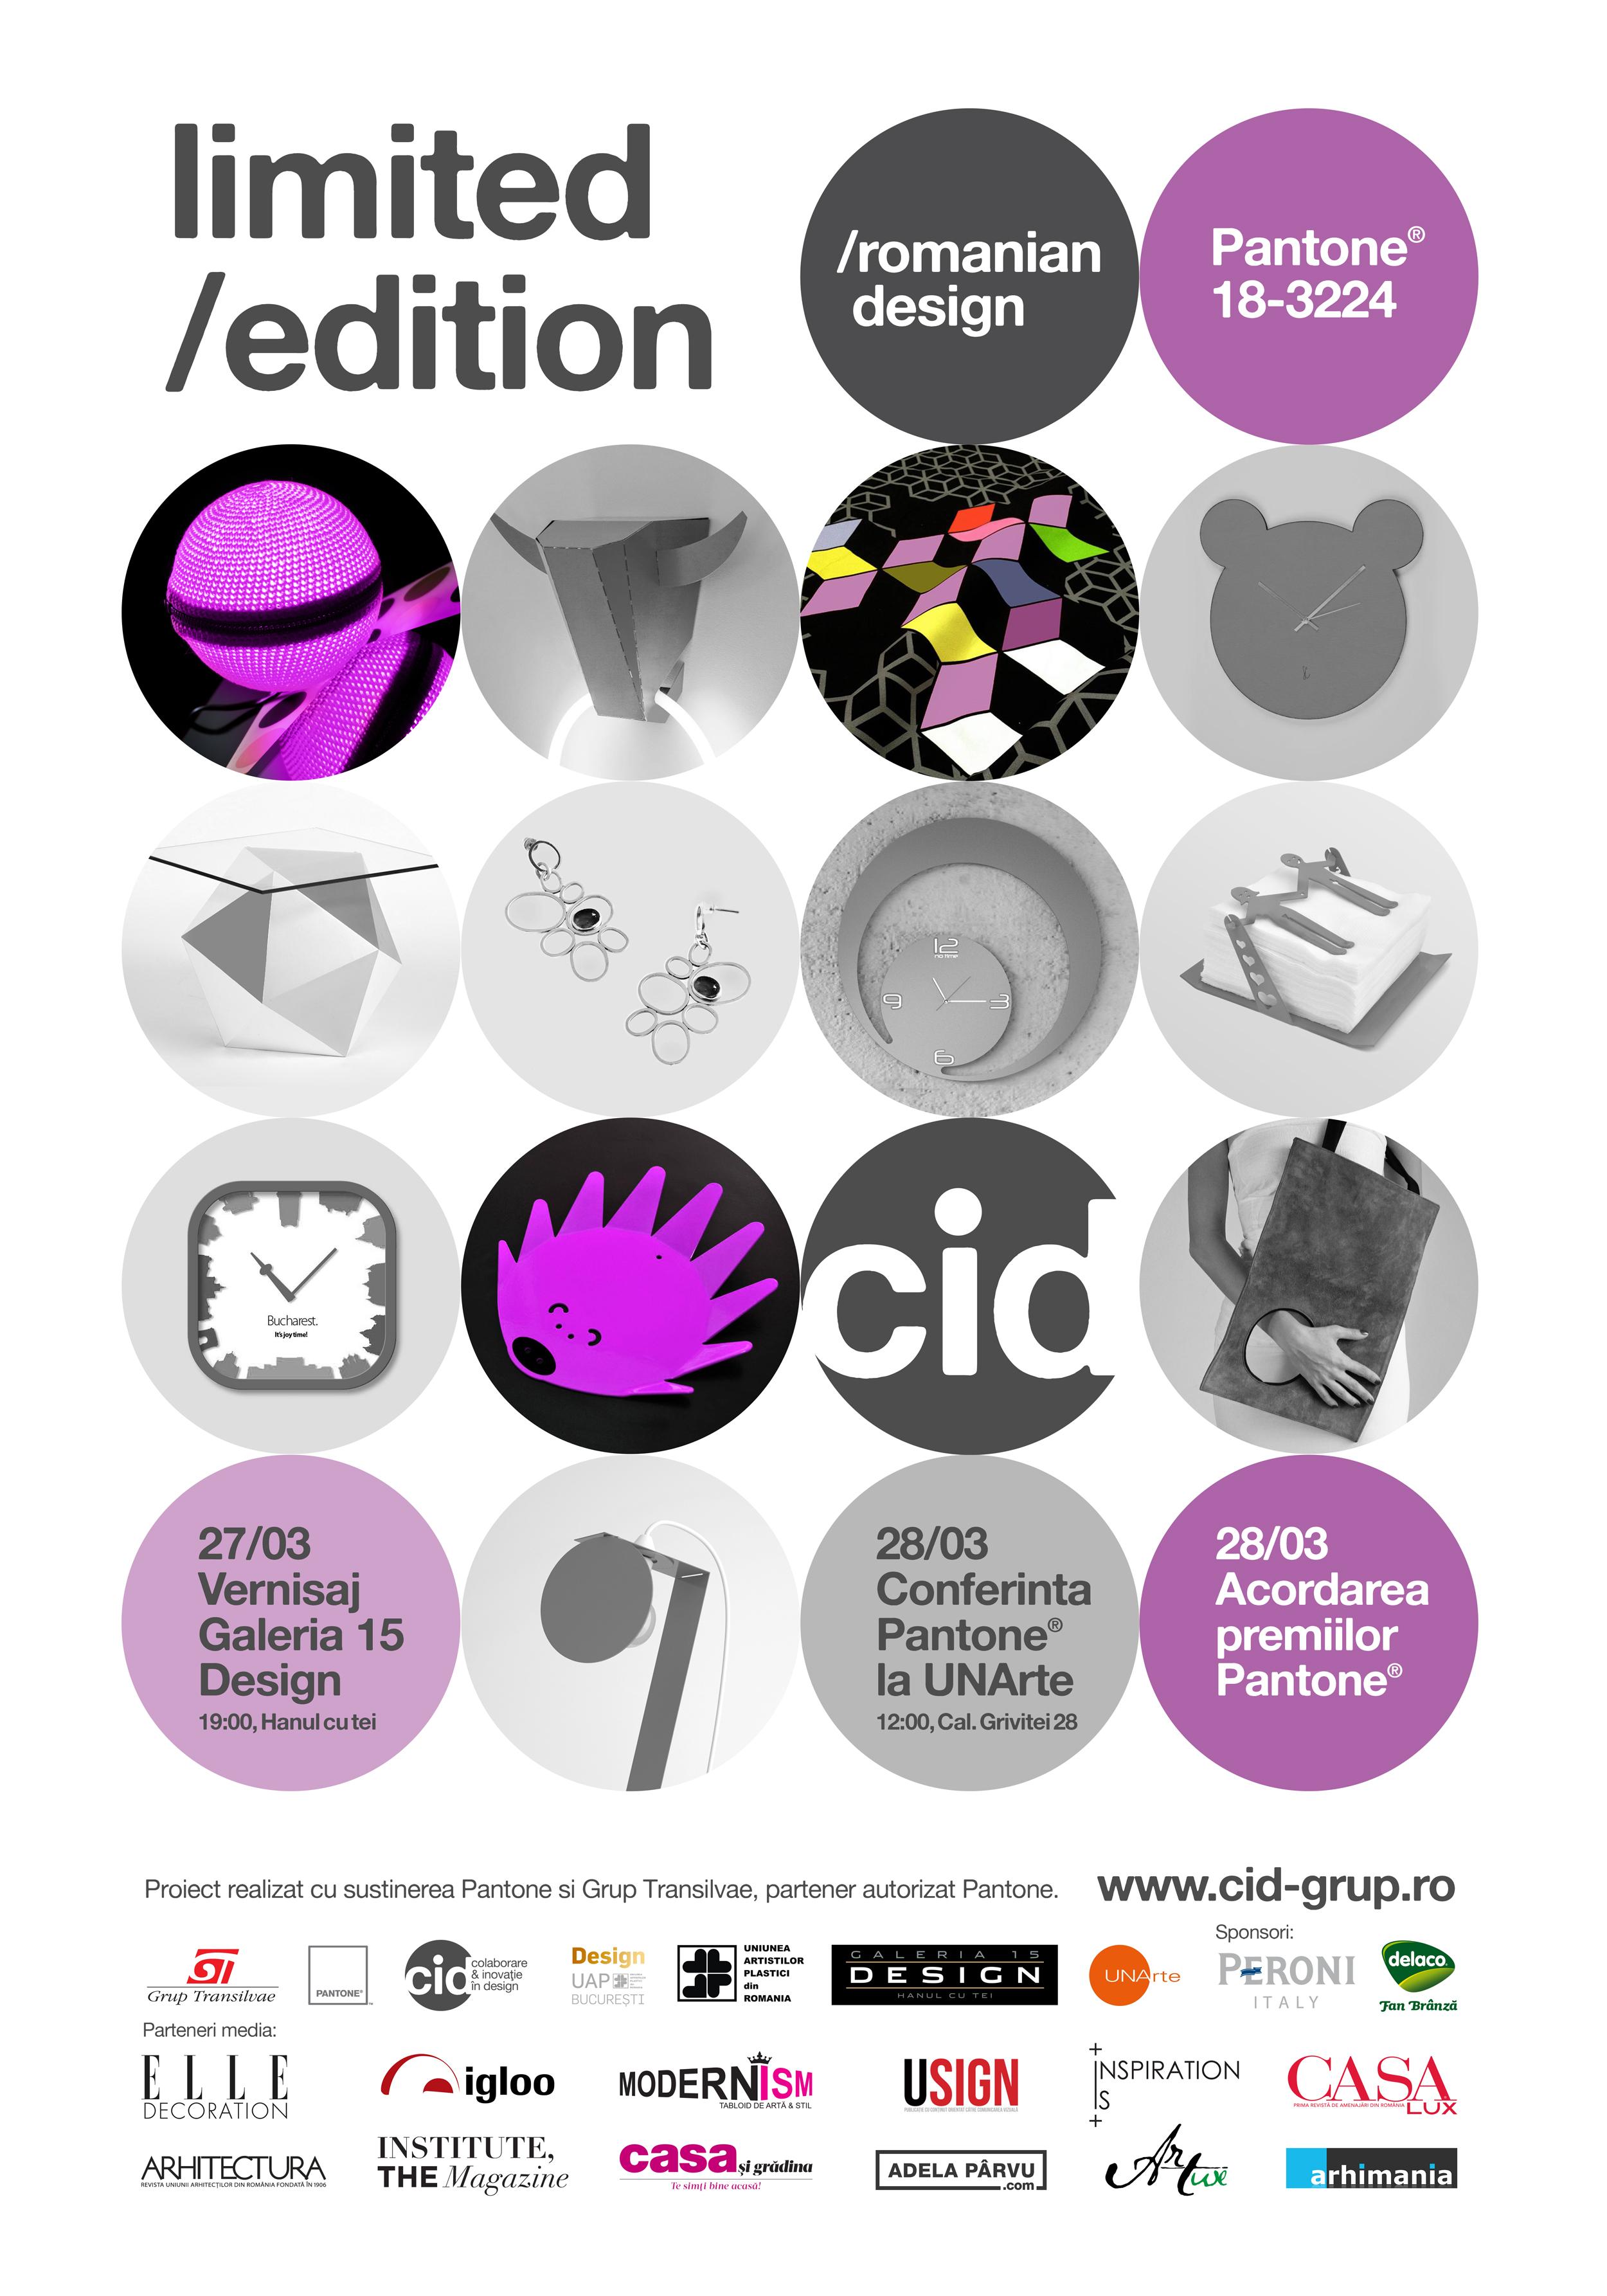 Poster design trends 2015 - Poster Design Trends 2015 Limited Edition Romanian Design Pantone 18 3224 Expo Working With Pantone